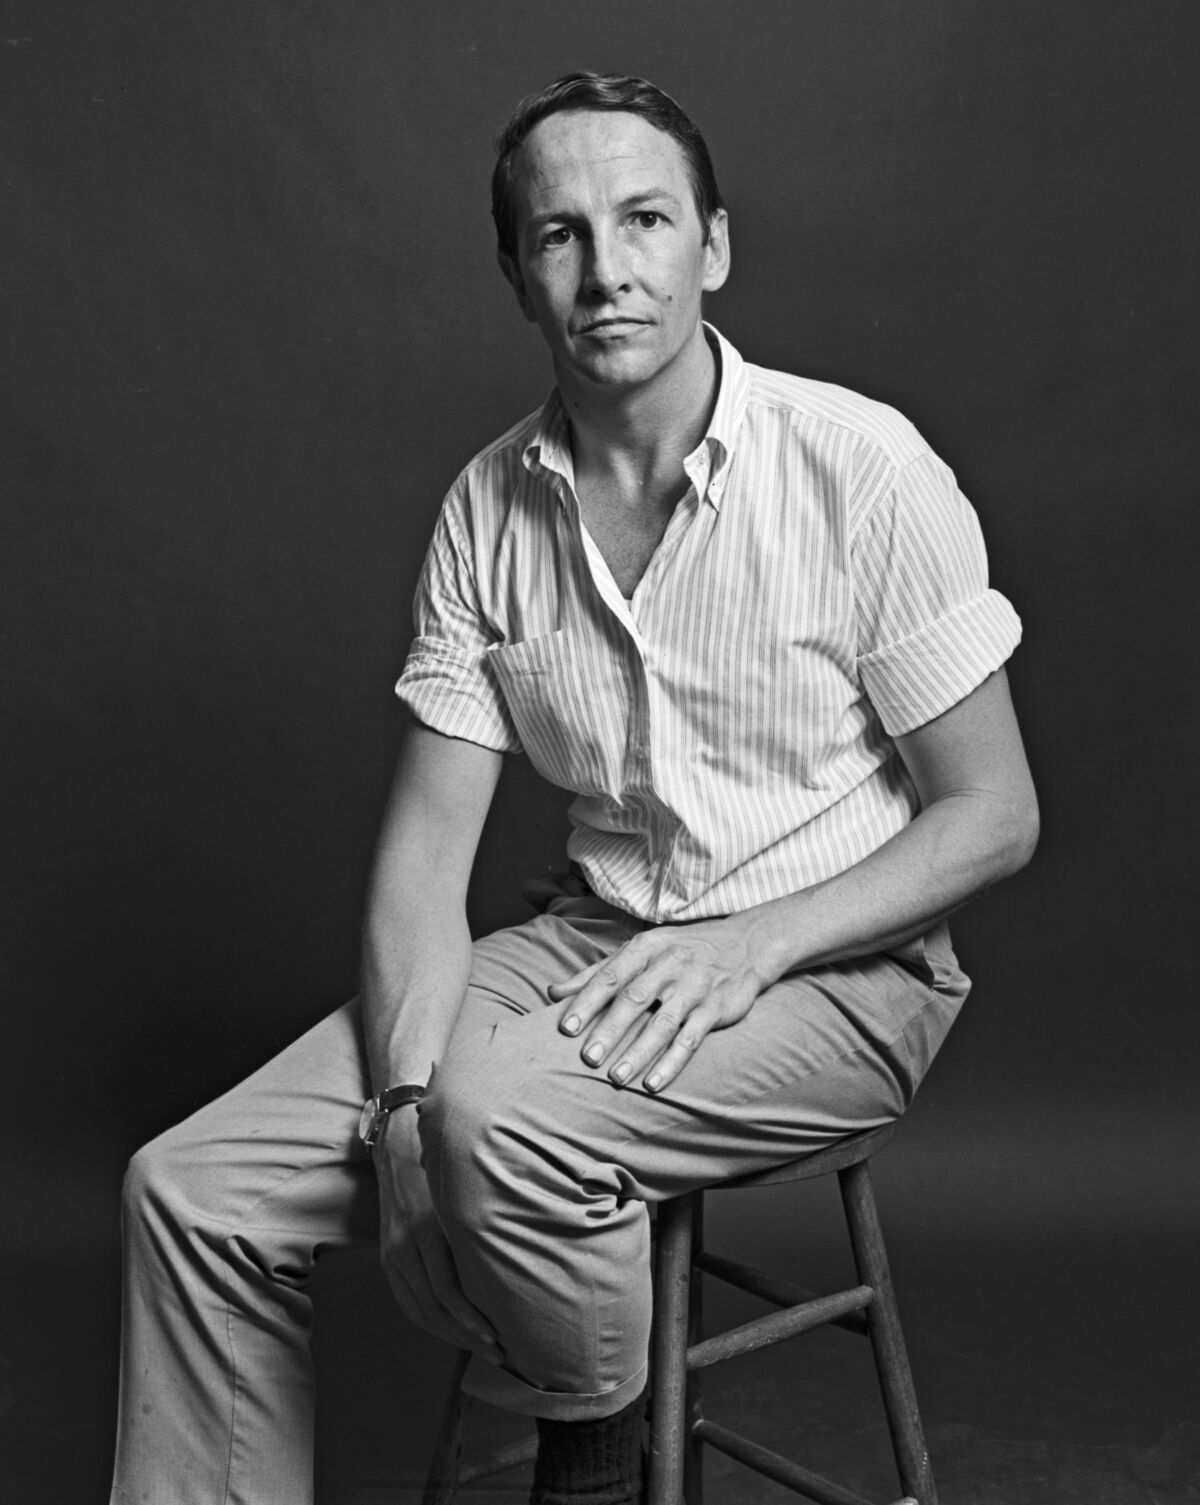 Portrait of Robert Rauschenberg by Jack Mitchell, 1966, via Getty Images.